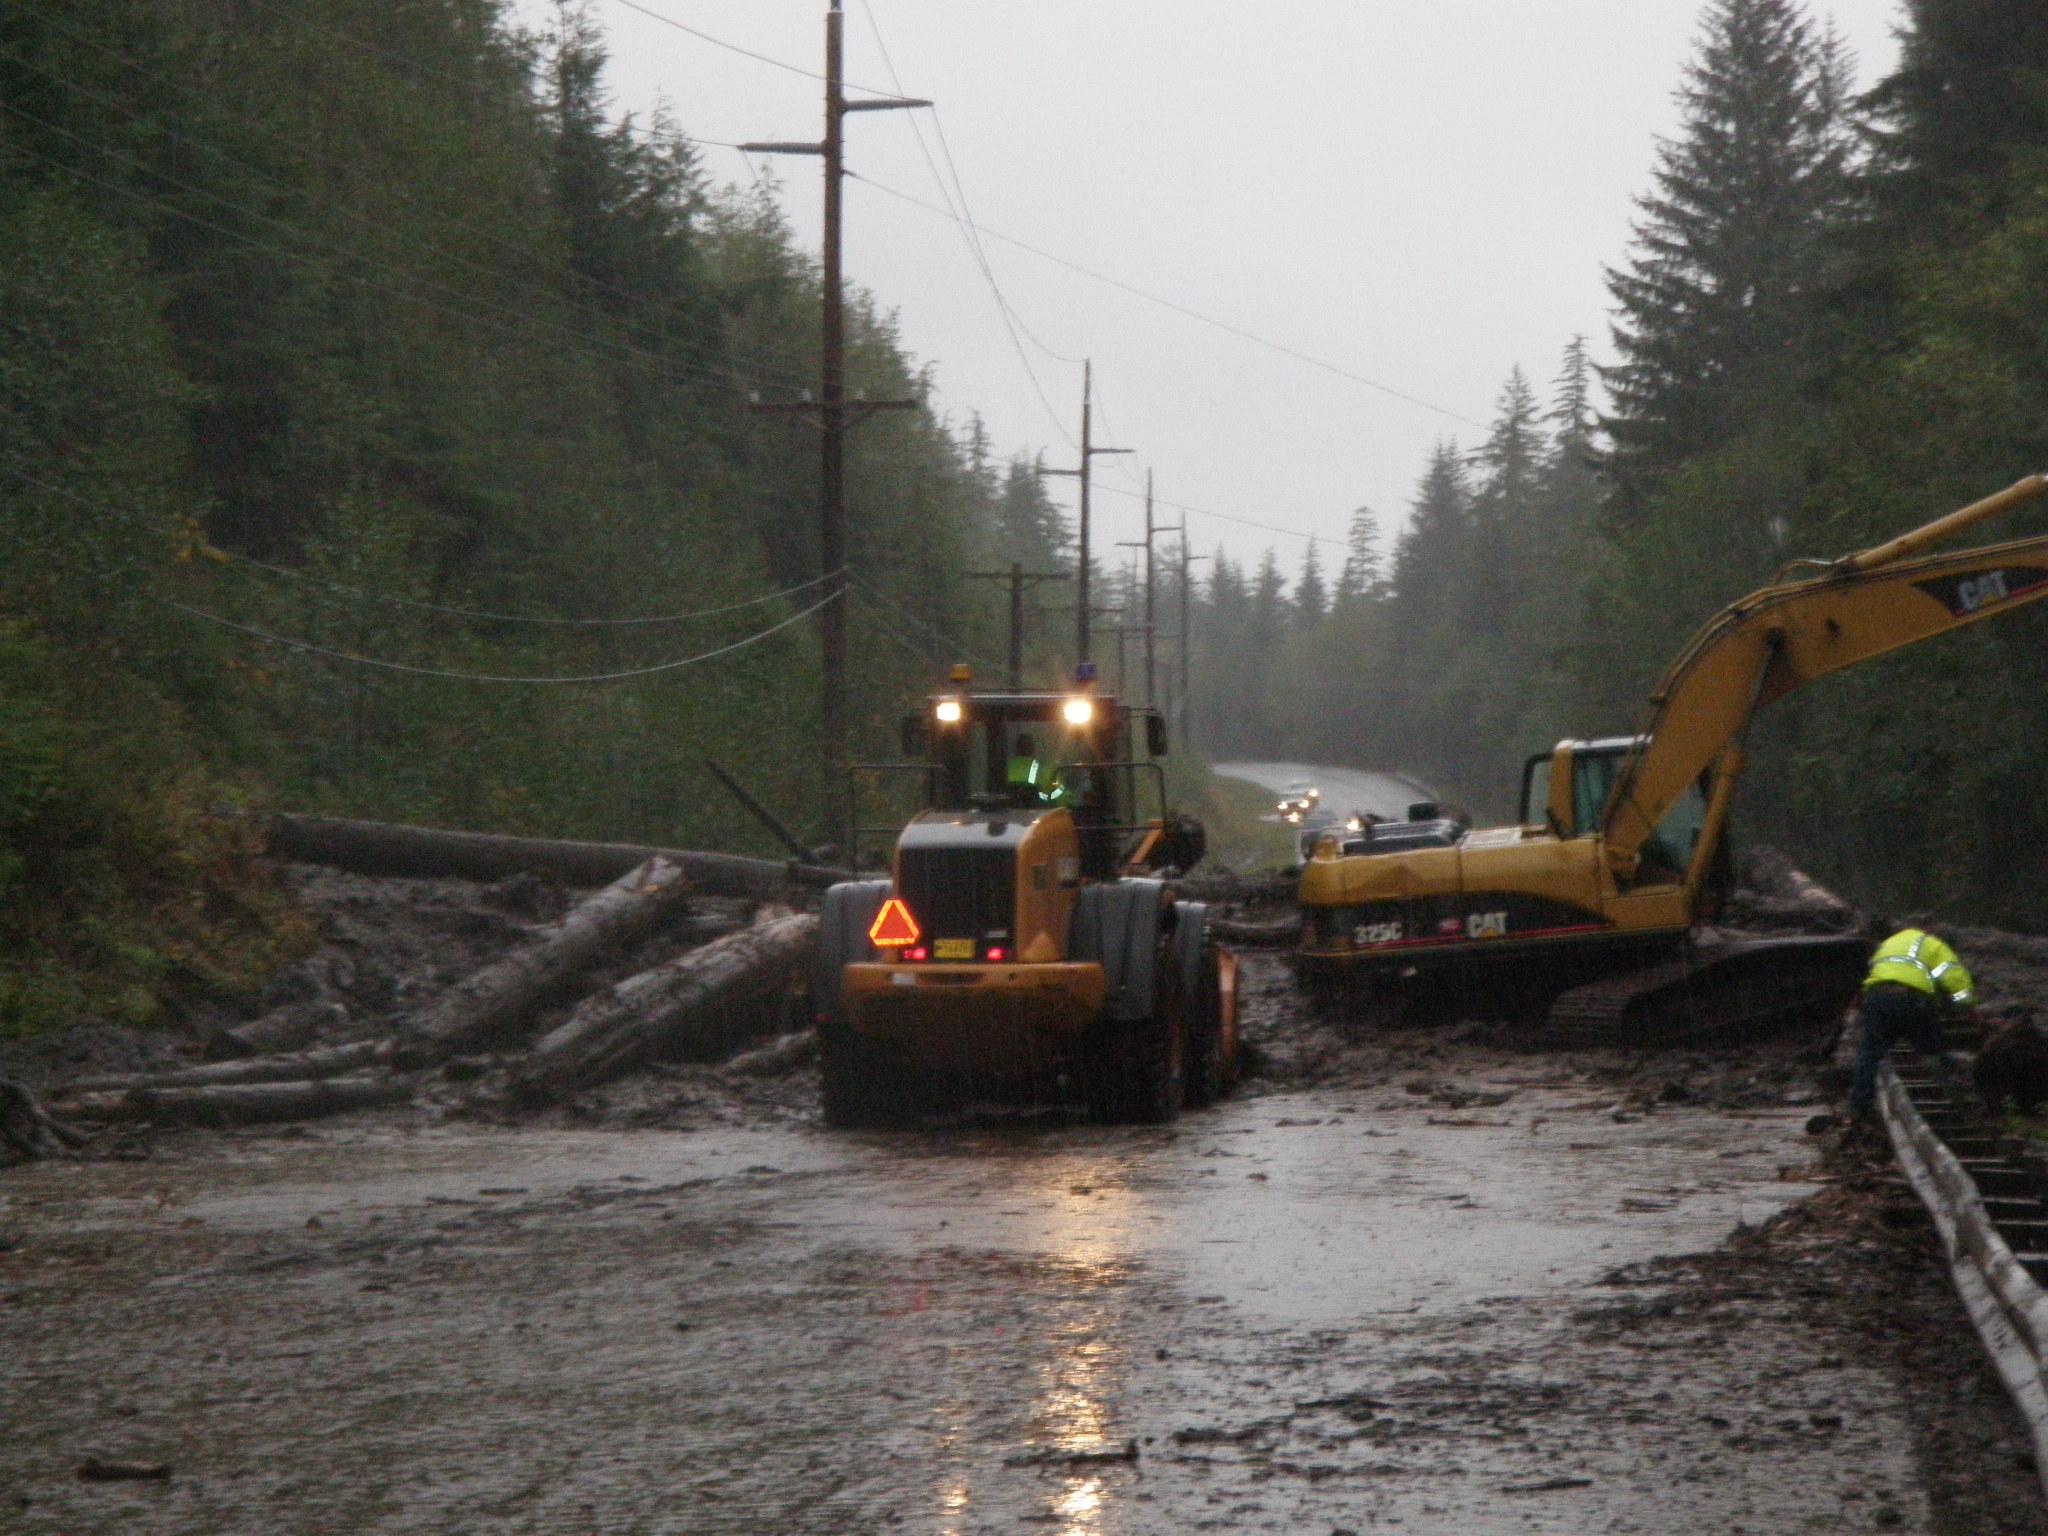 Crews worked to clear this landslide that blocked Mitkof Highway in September of 2009. (KFSK file photo)